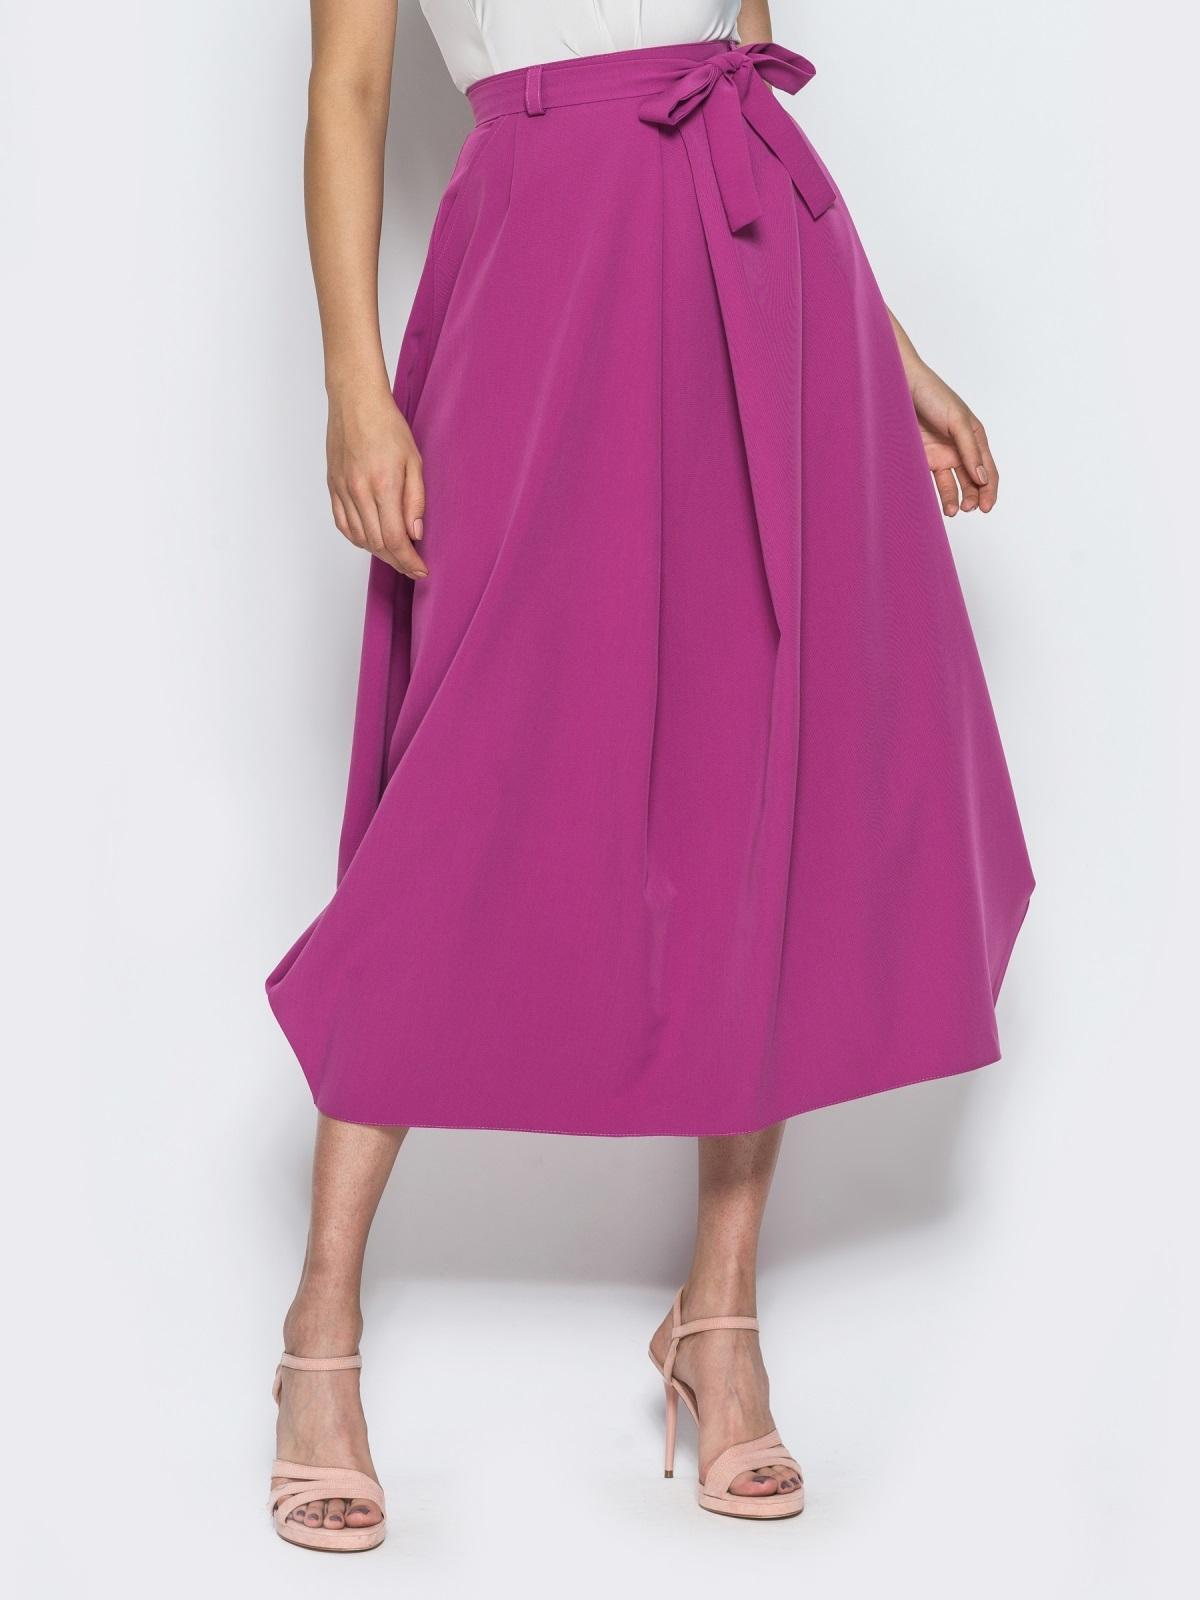 Юбка-миди свободного кроя с карманами в швах розовая 14381, фото 1